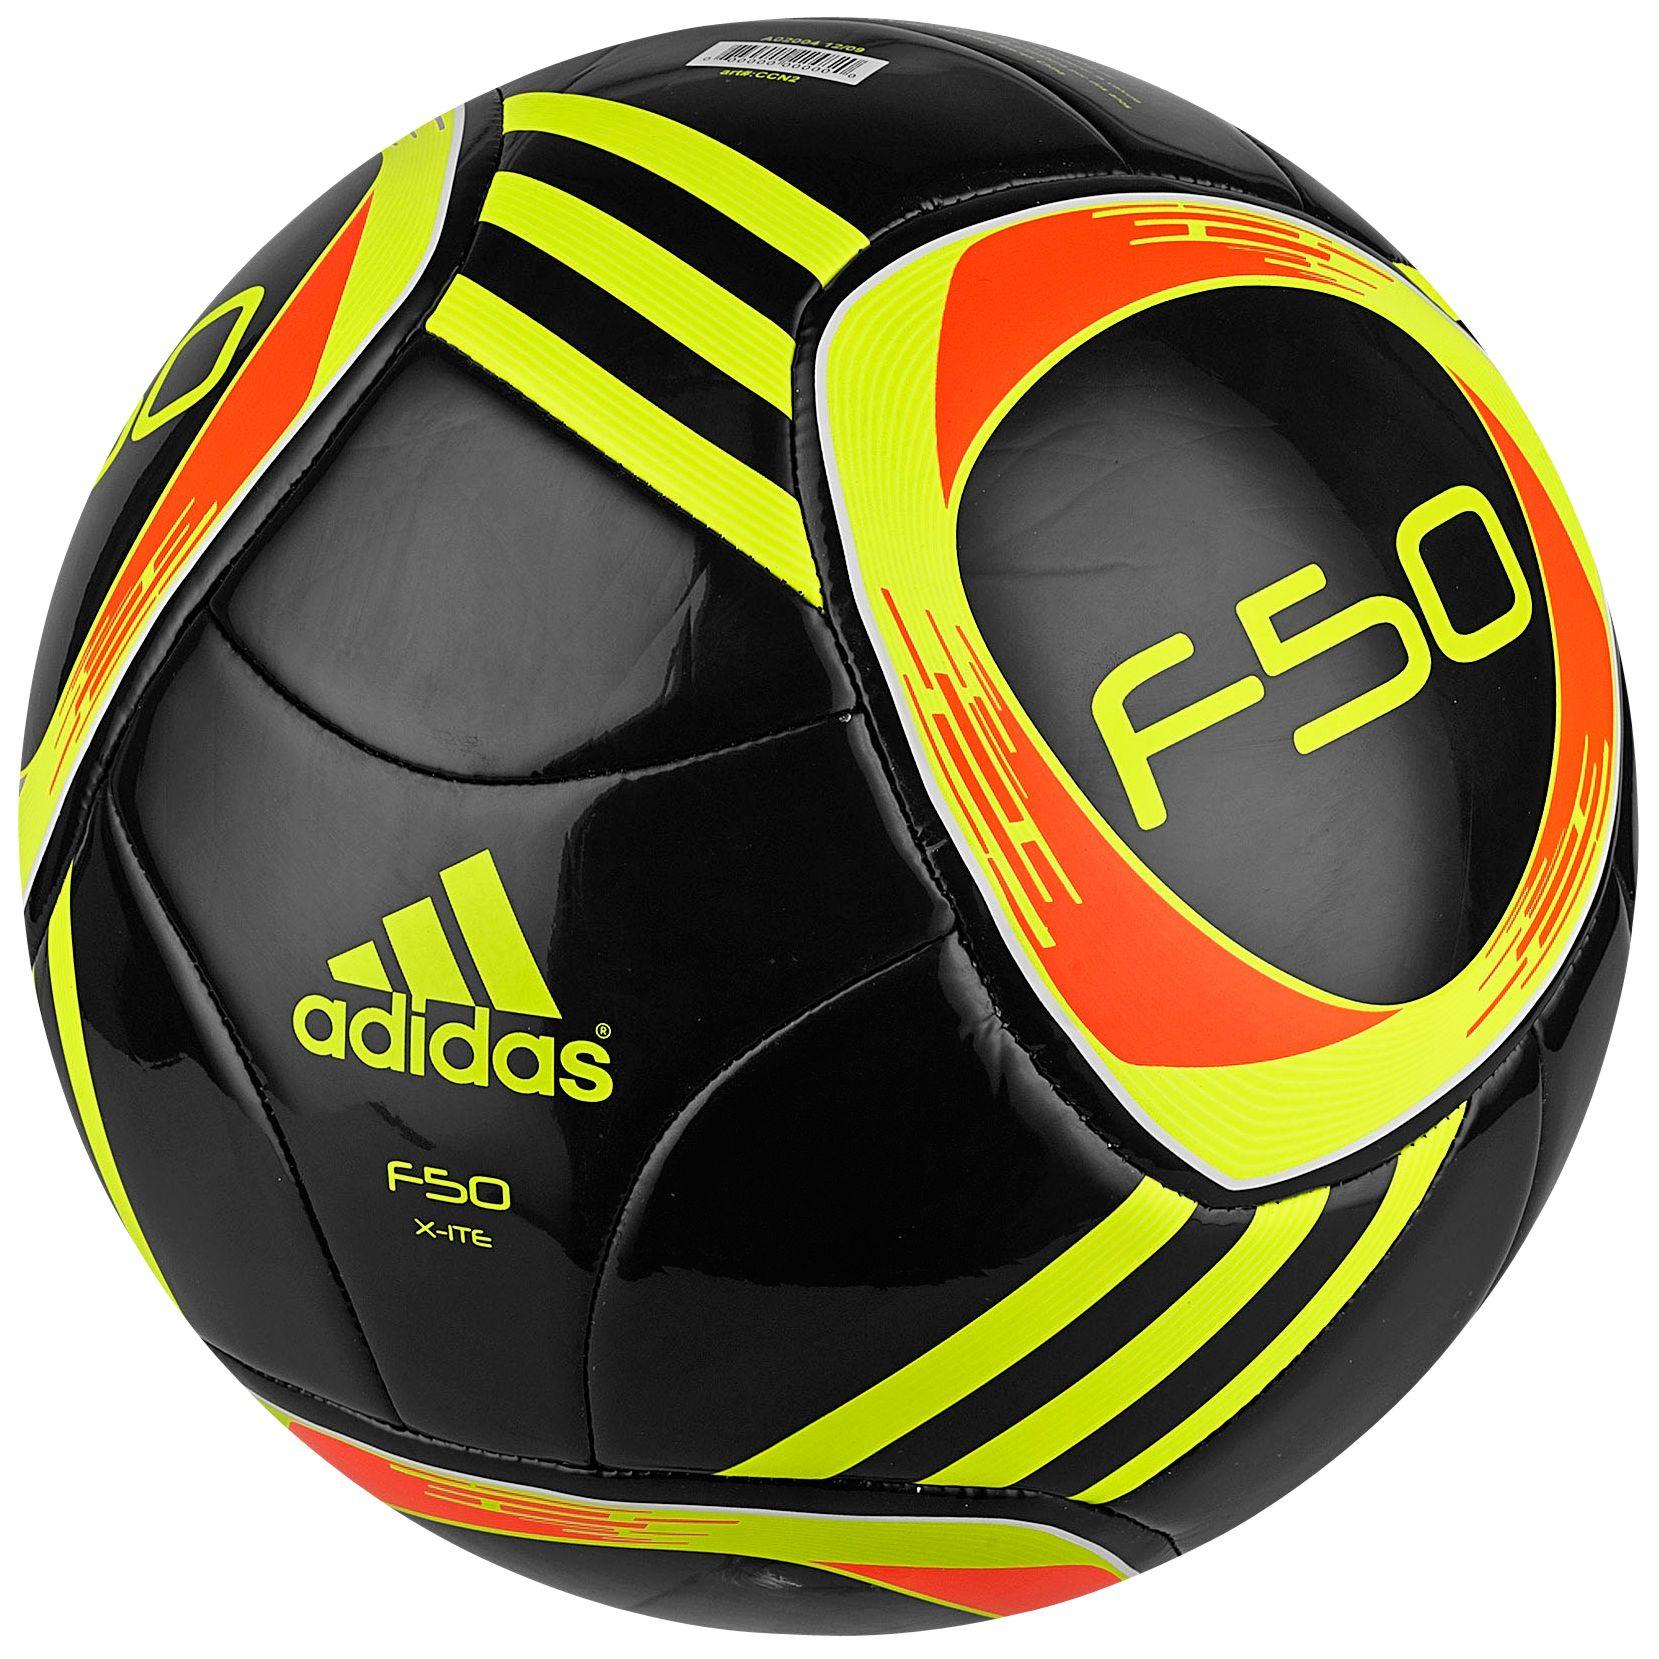 Adidas F50 X-ite Football